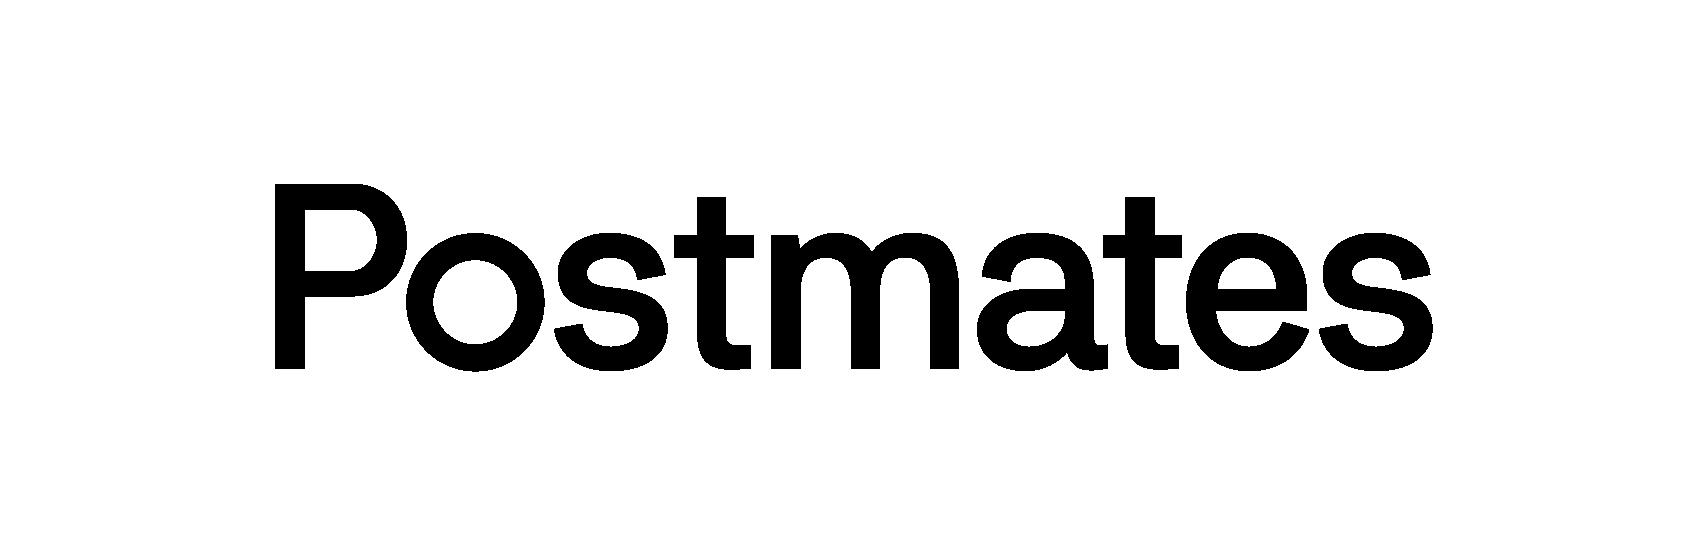 Concordia and Postmates Programming Sponsorship.